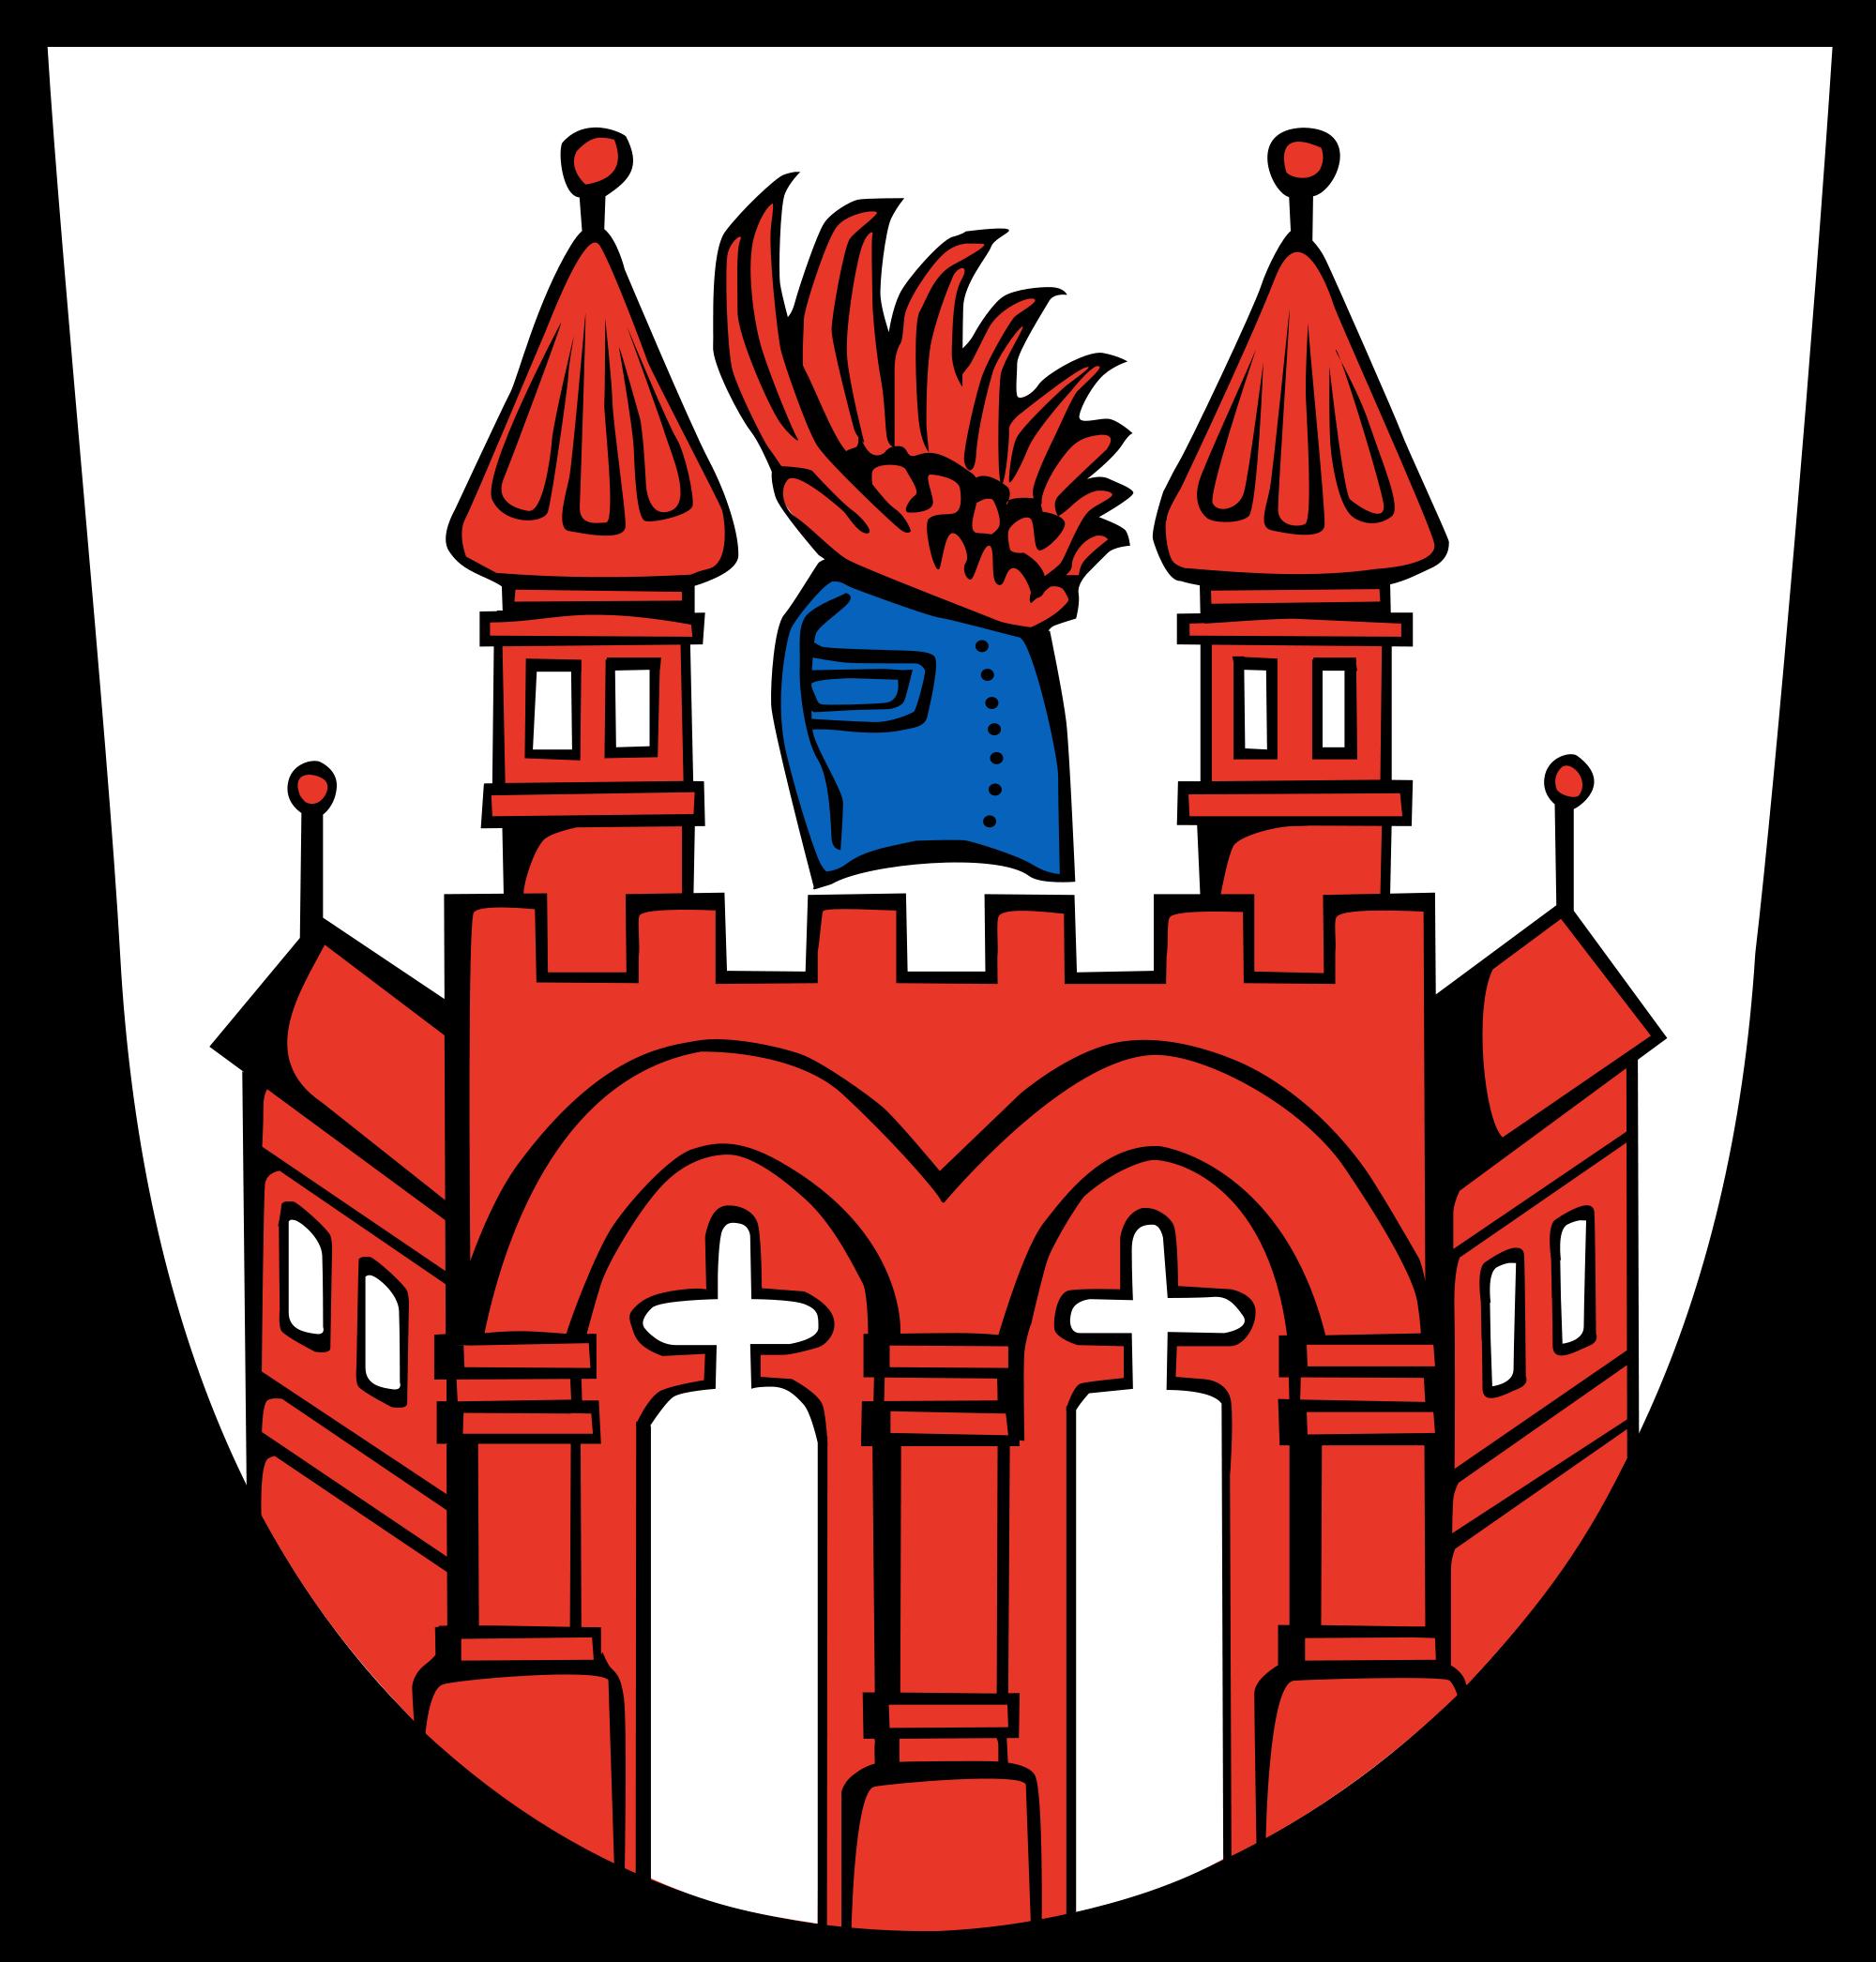 File:Wappen Neubrandenburg.svg.